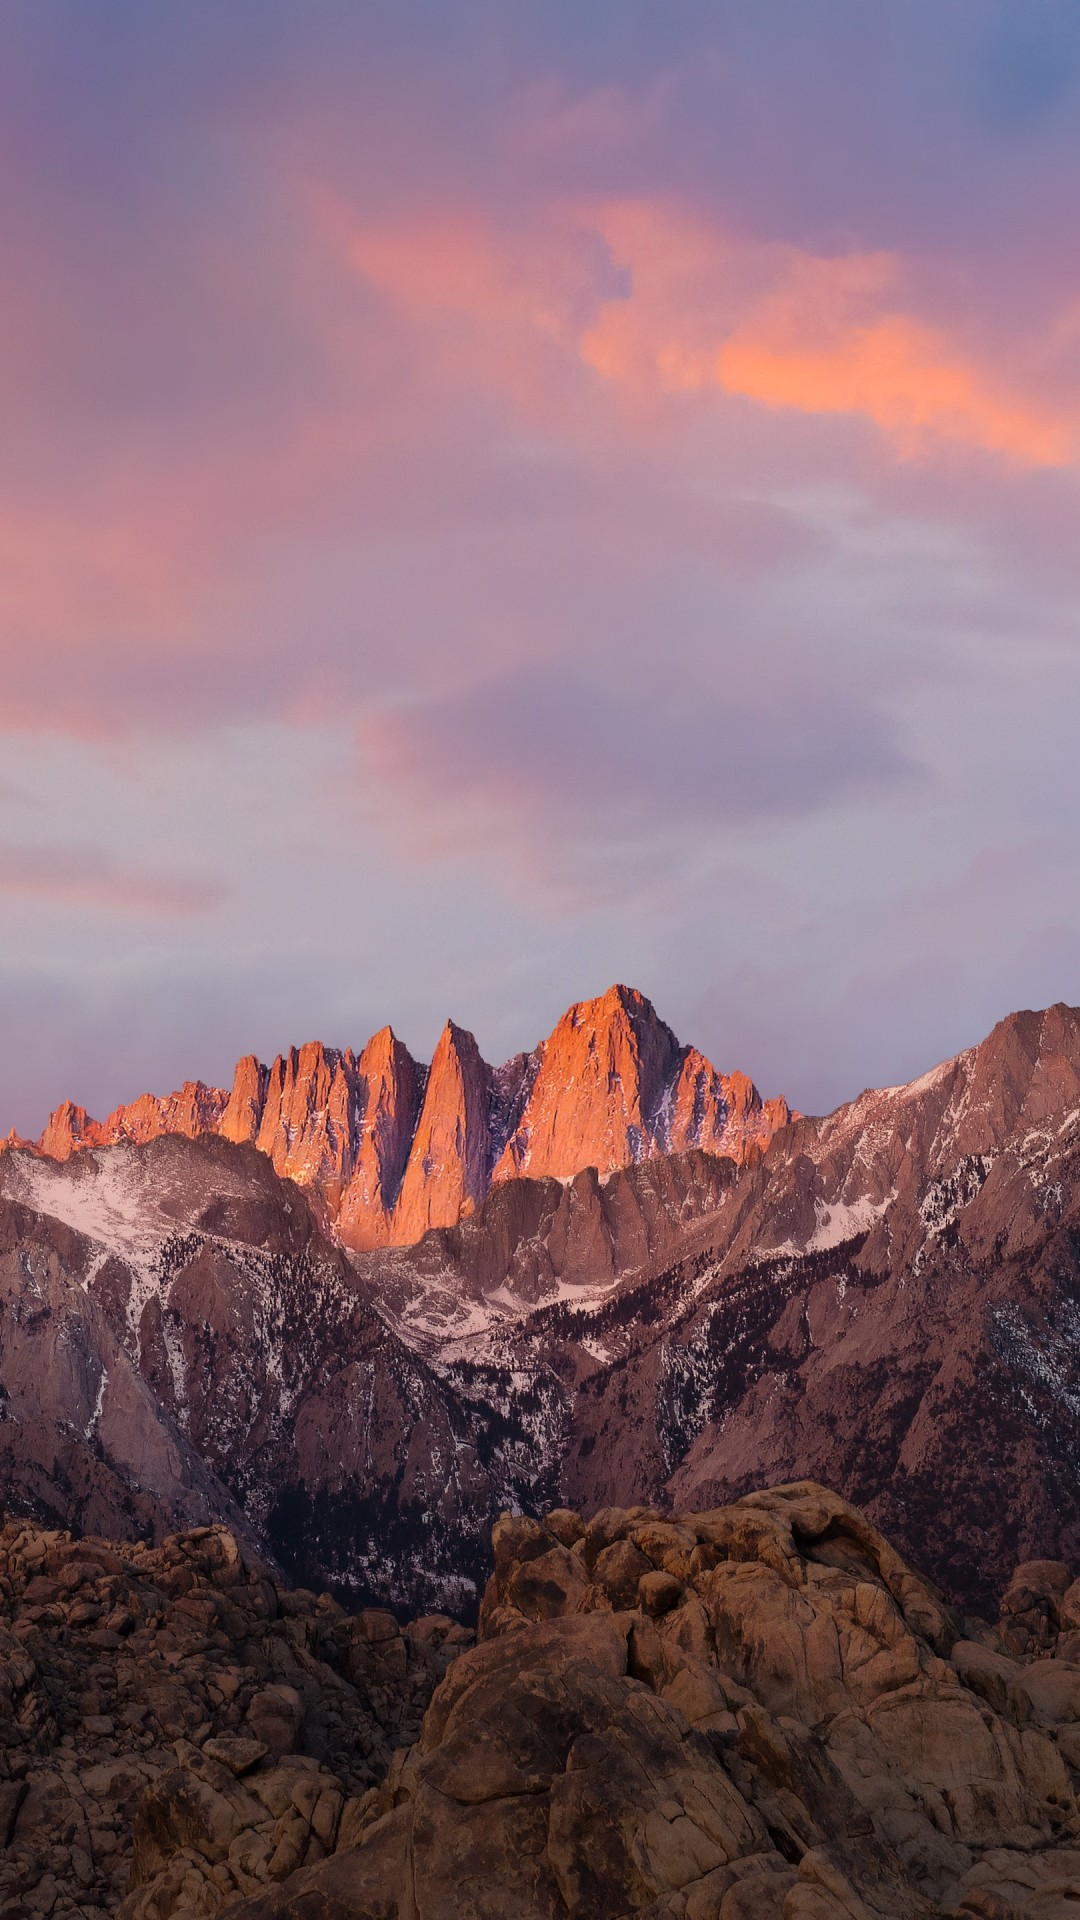 Wallpaper mountains macos 4k 5k sierra sky iphone - Wallpaper pc 4k ...